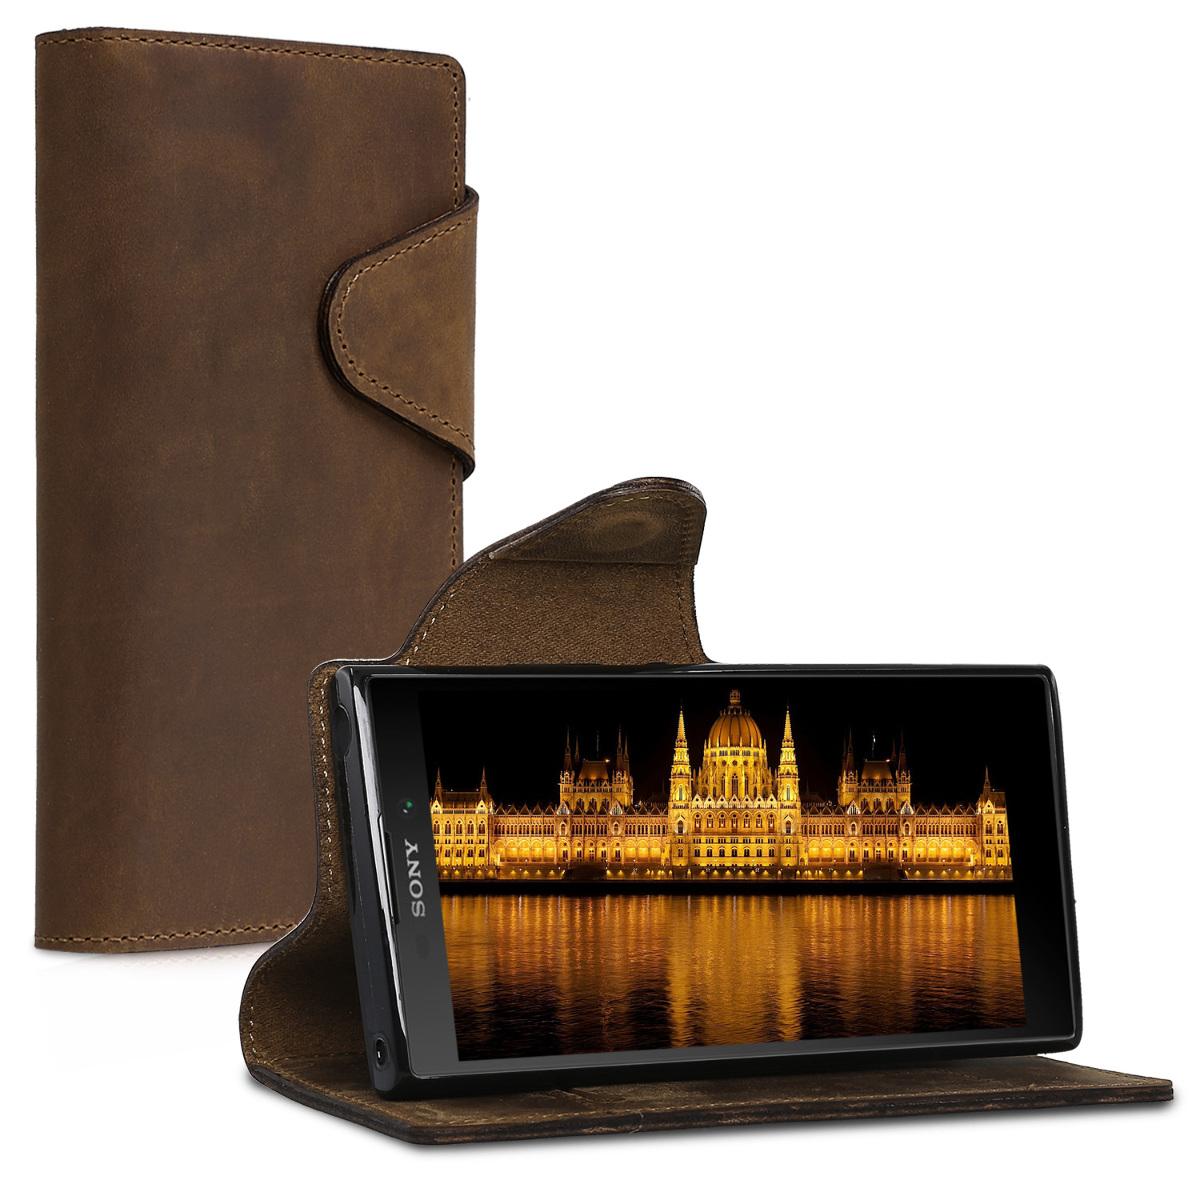 Kalibri Δερμάτινη Suede Θήκη - Πορτοφόλι Sony Xperia XA2 - Brown (44292.05)